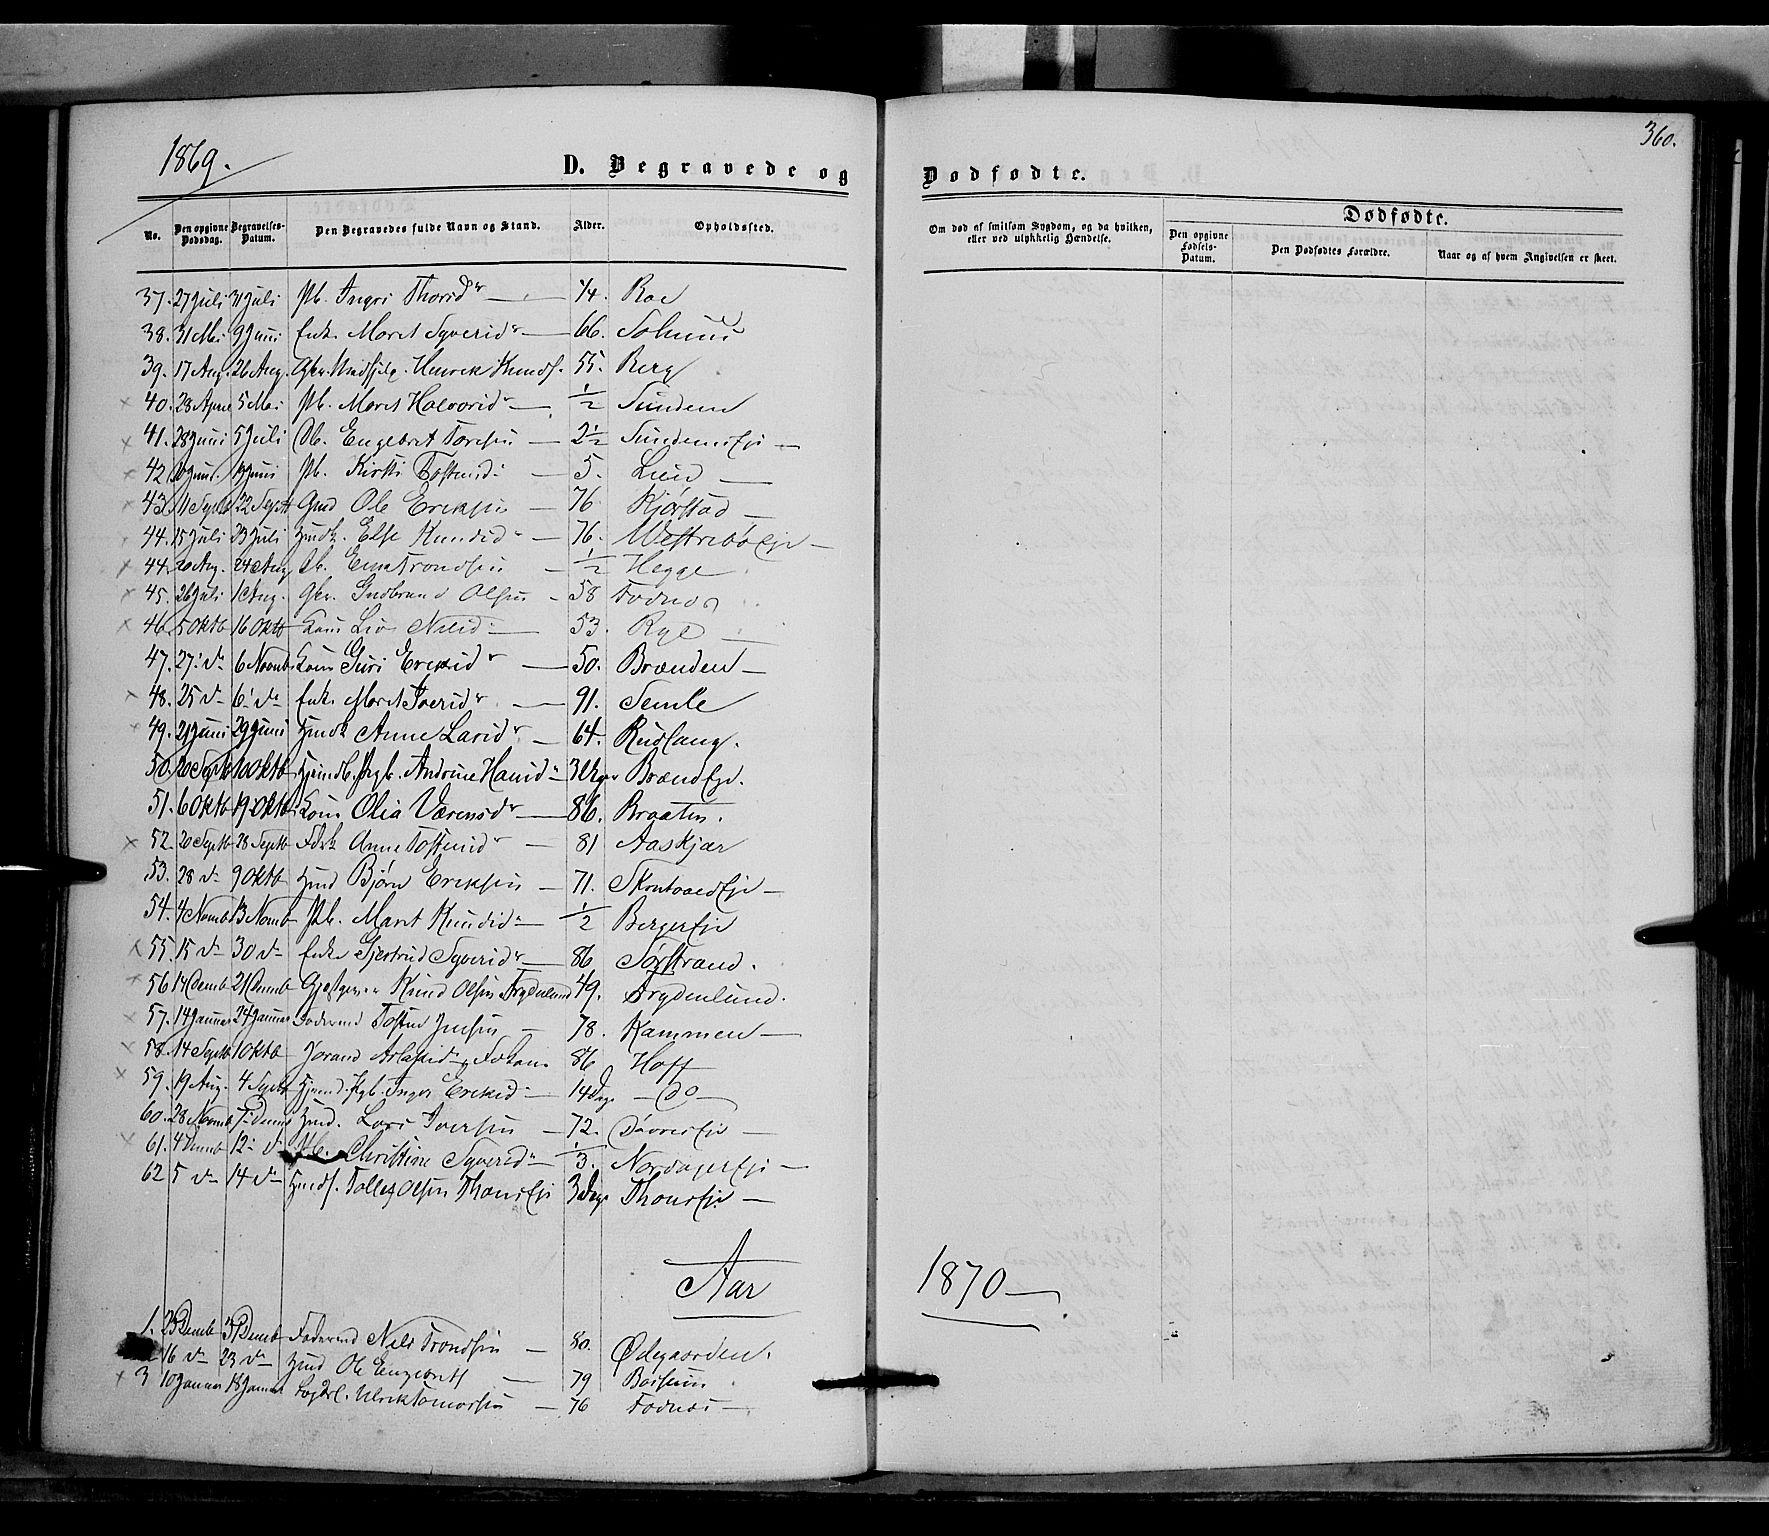 SAH, Nord-Aurdal prestekontor, Ministerialbok nr. 8, 1863-1875, s. 360